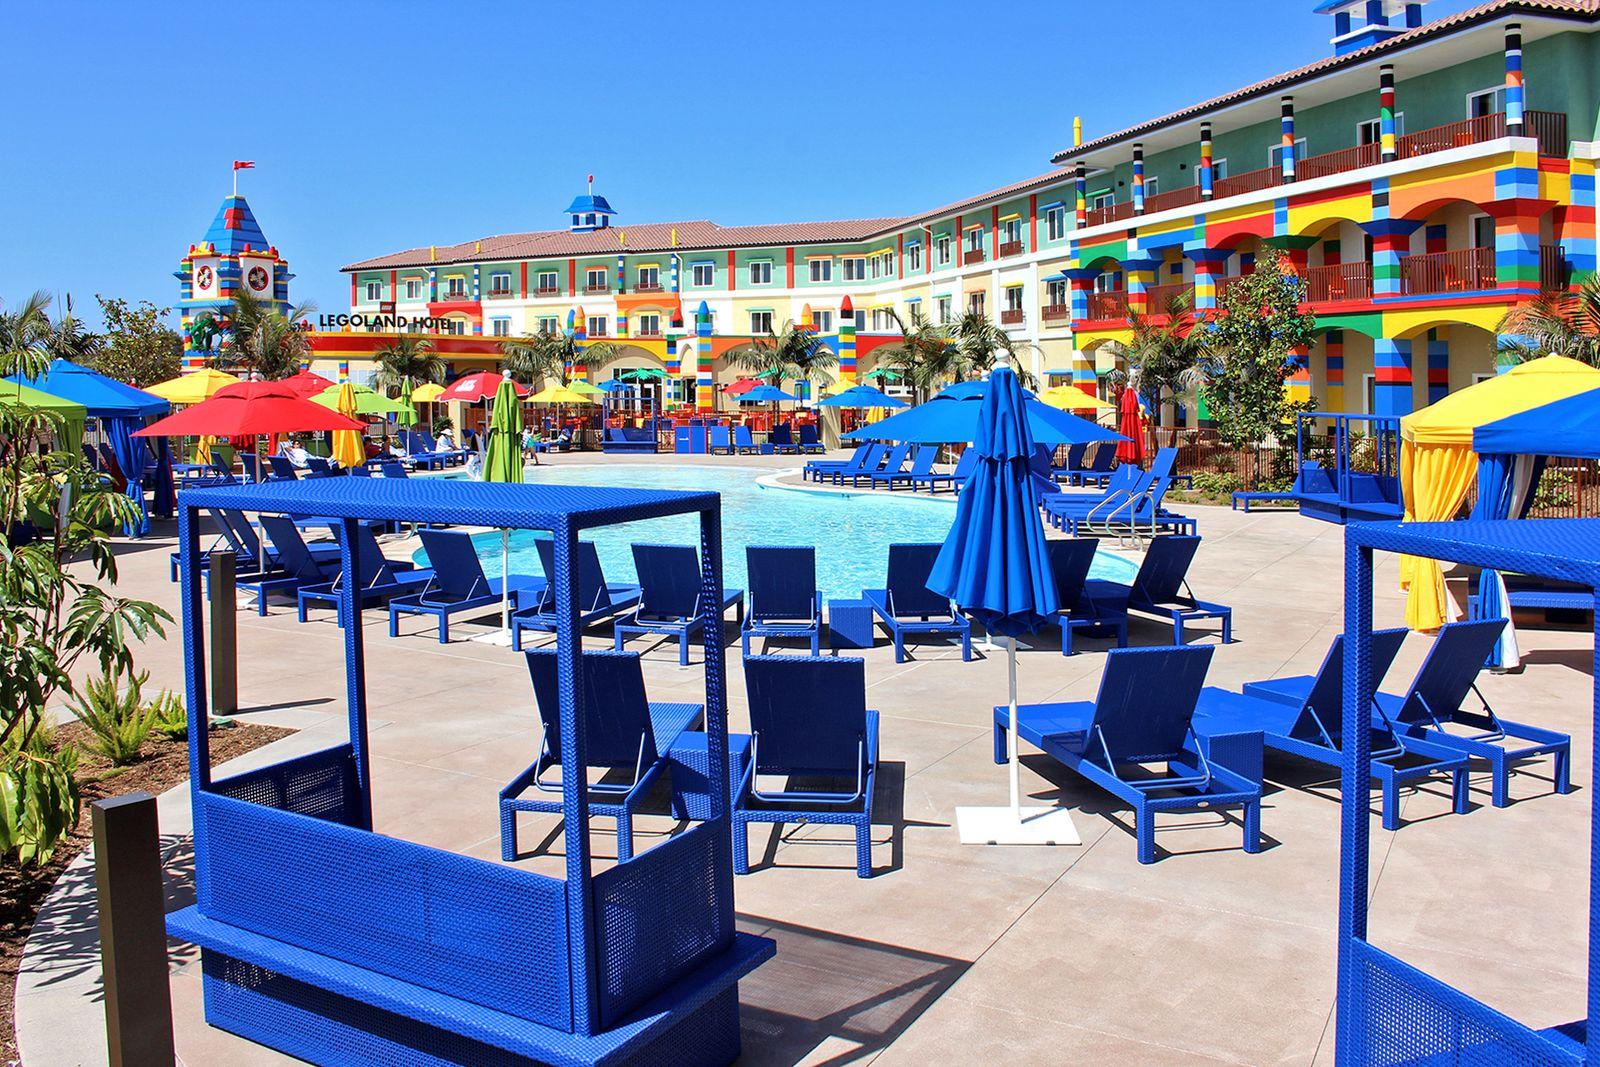 Legoland Hotel Restaurant Carlsbad